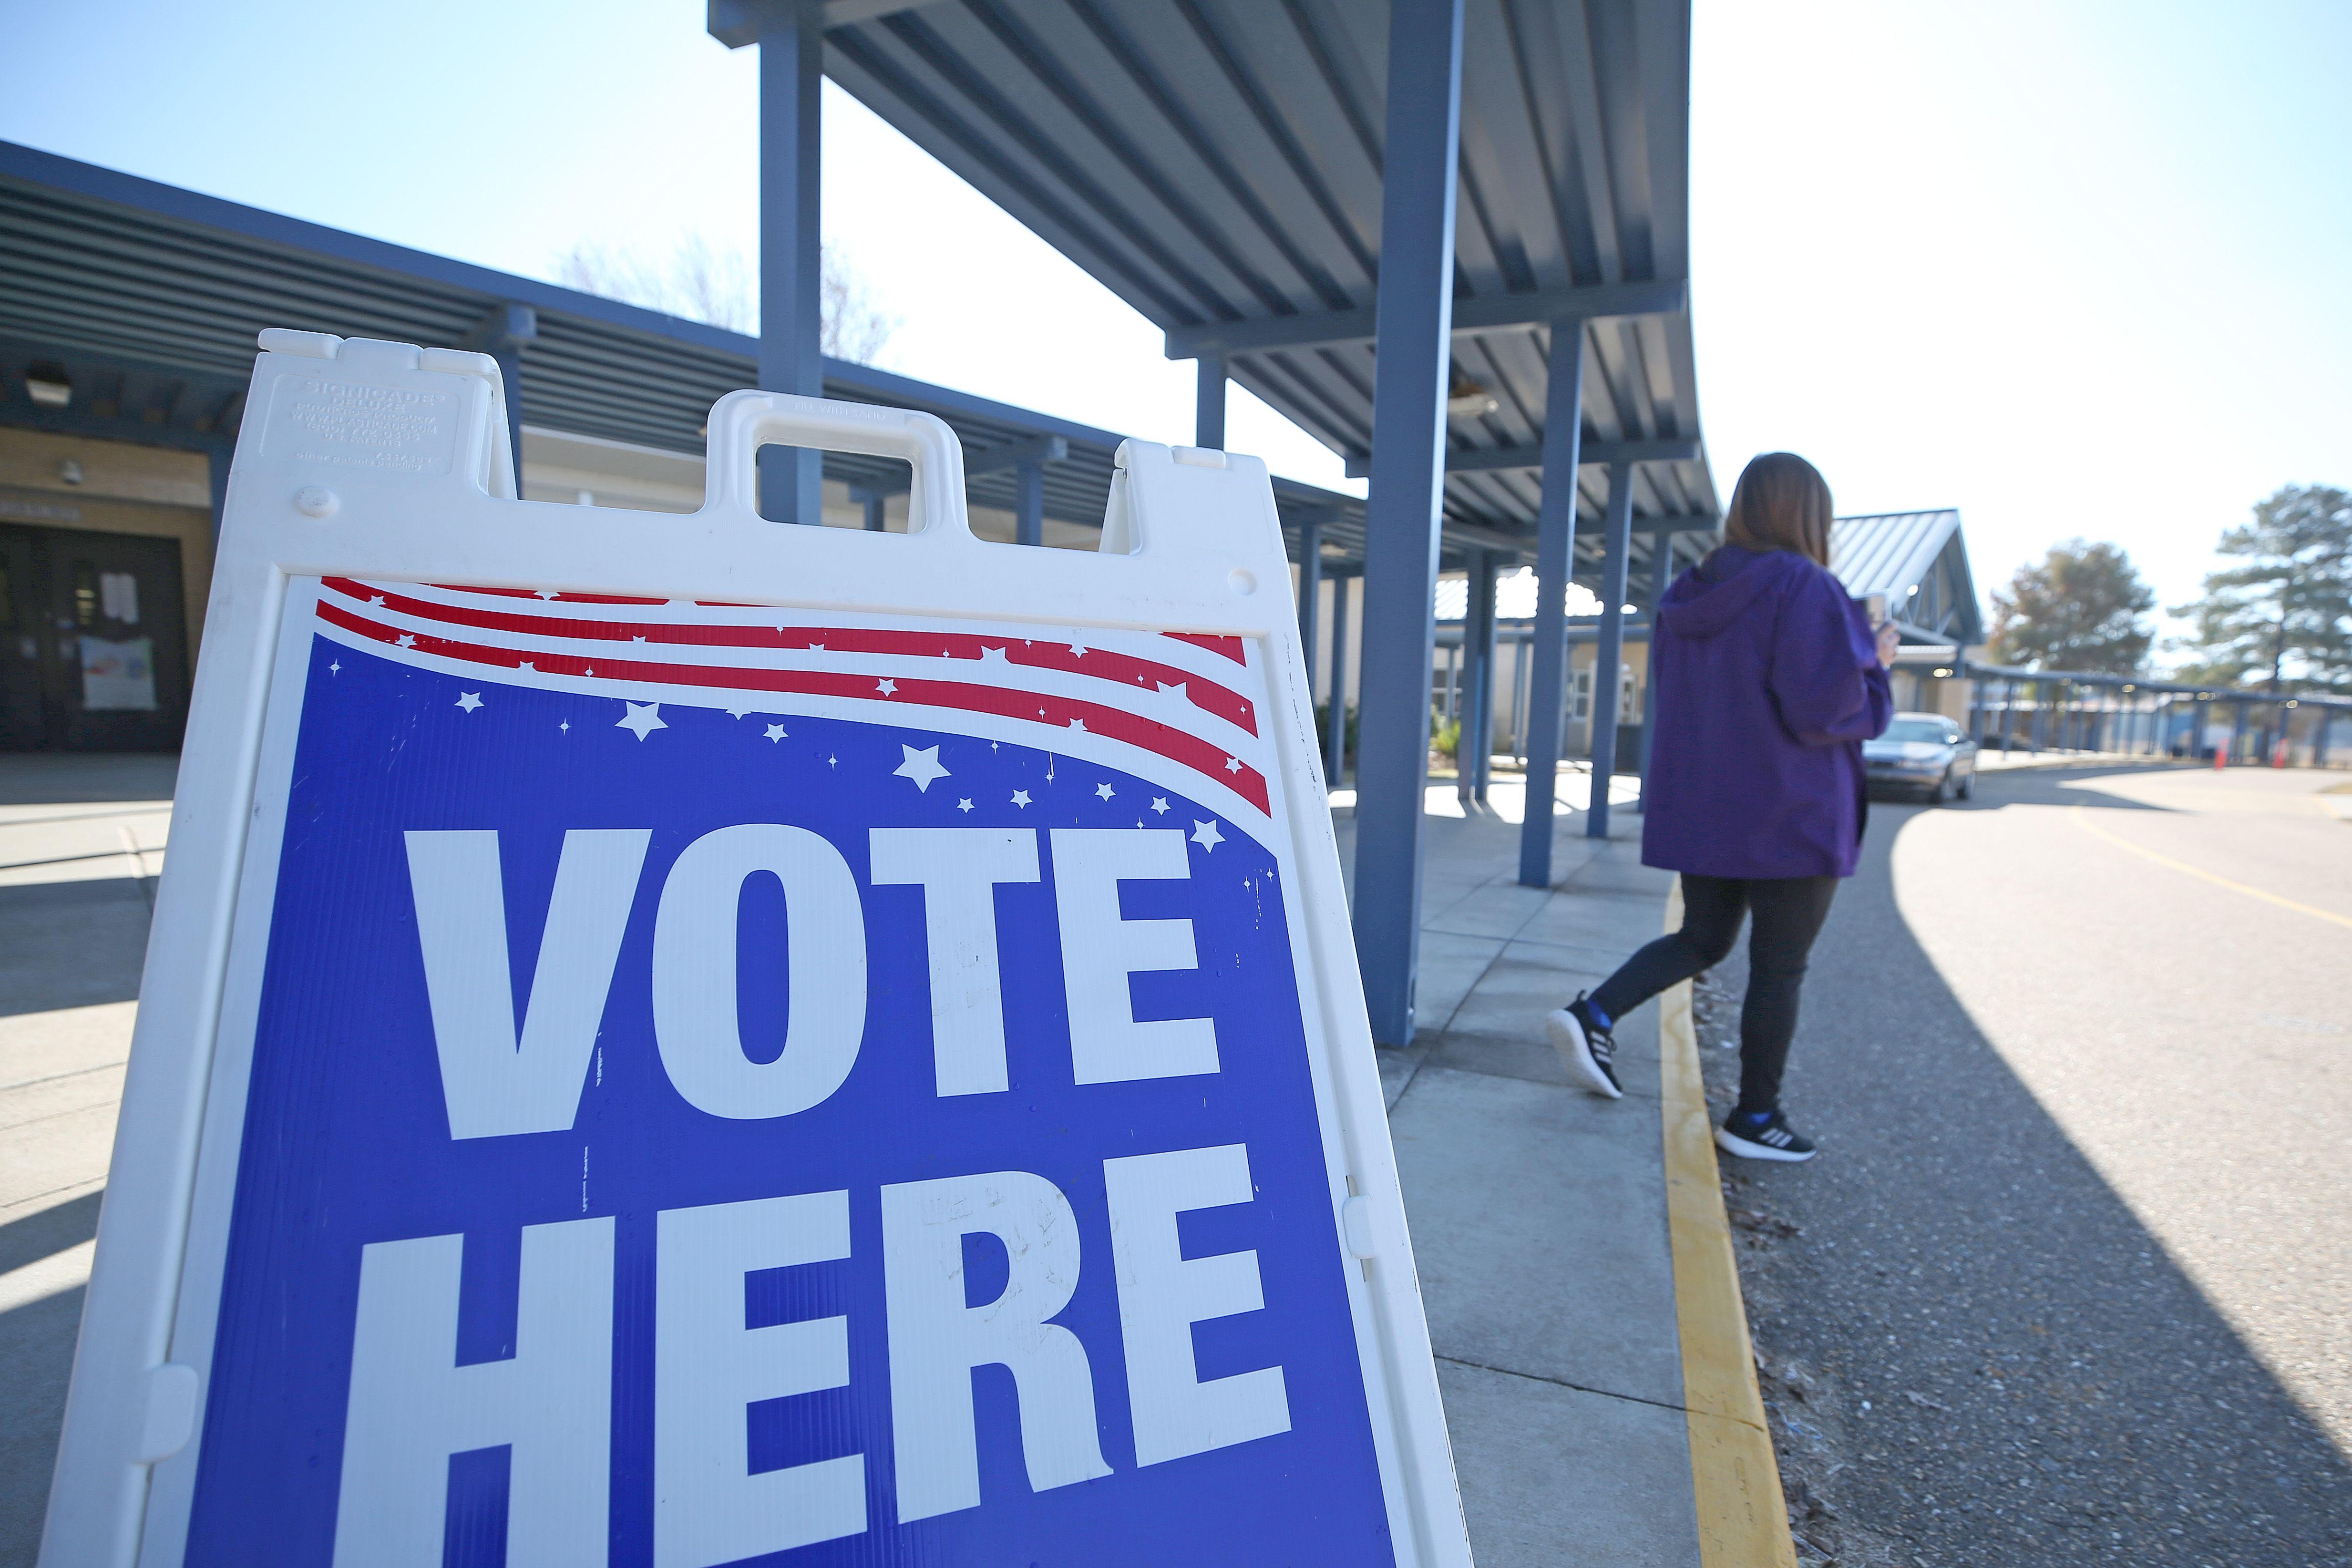 Democratic primaries in flux over coronavirus concerns